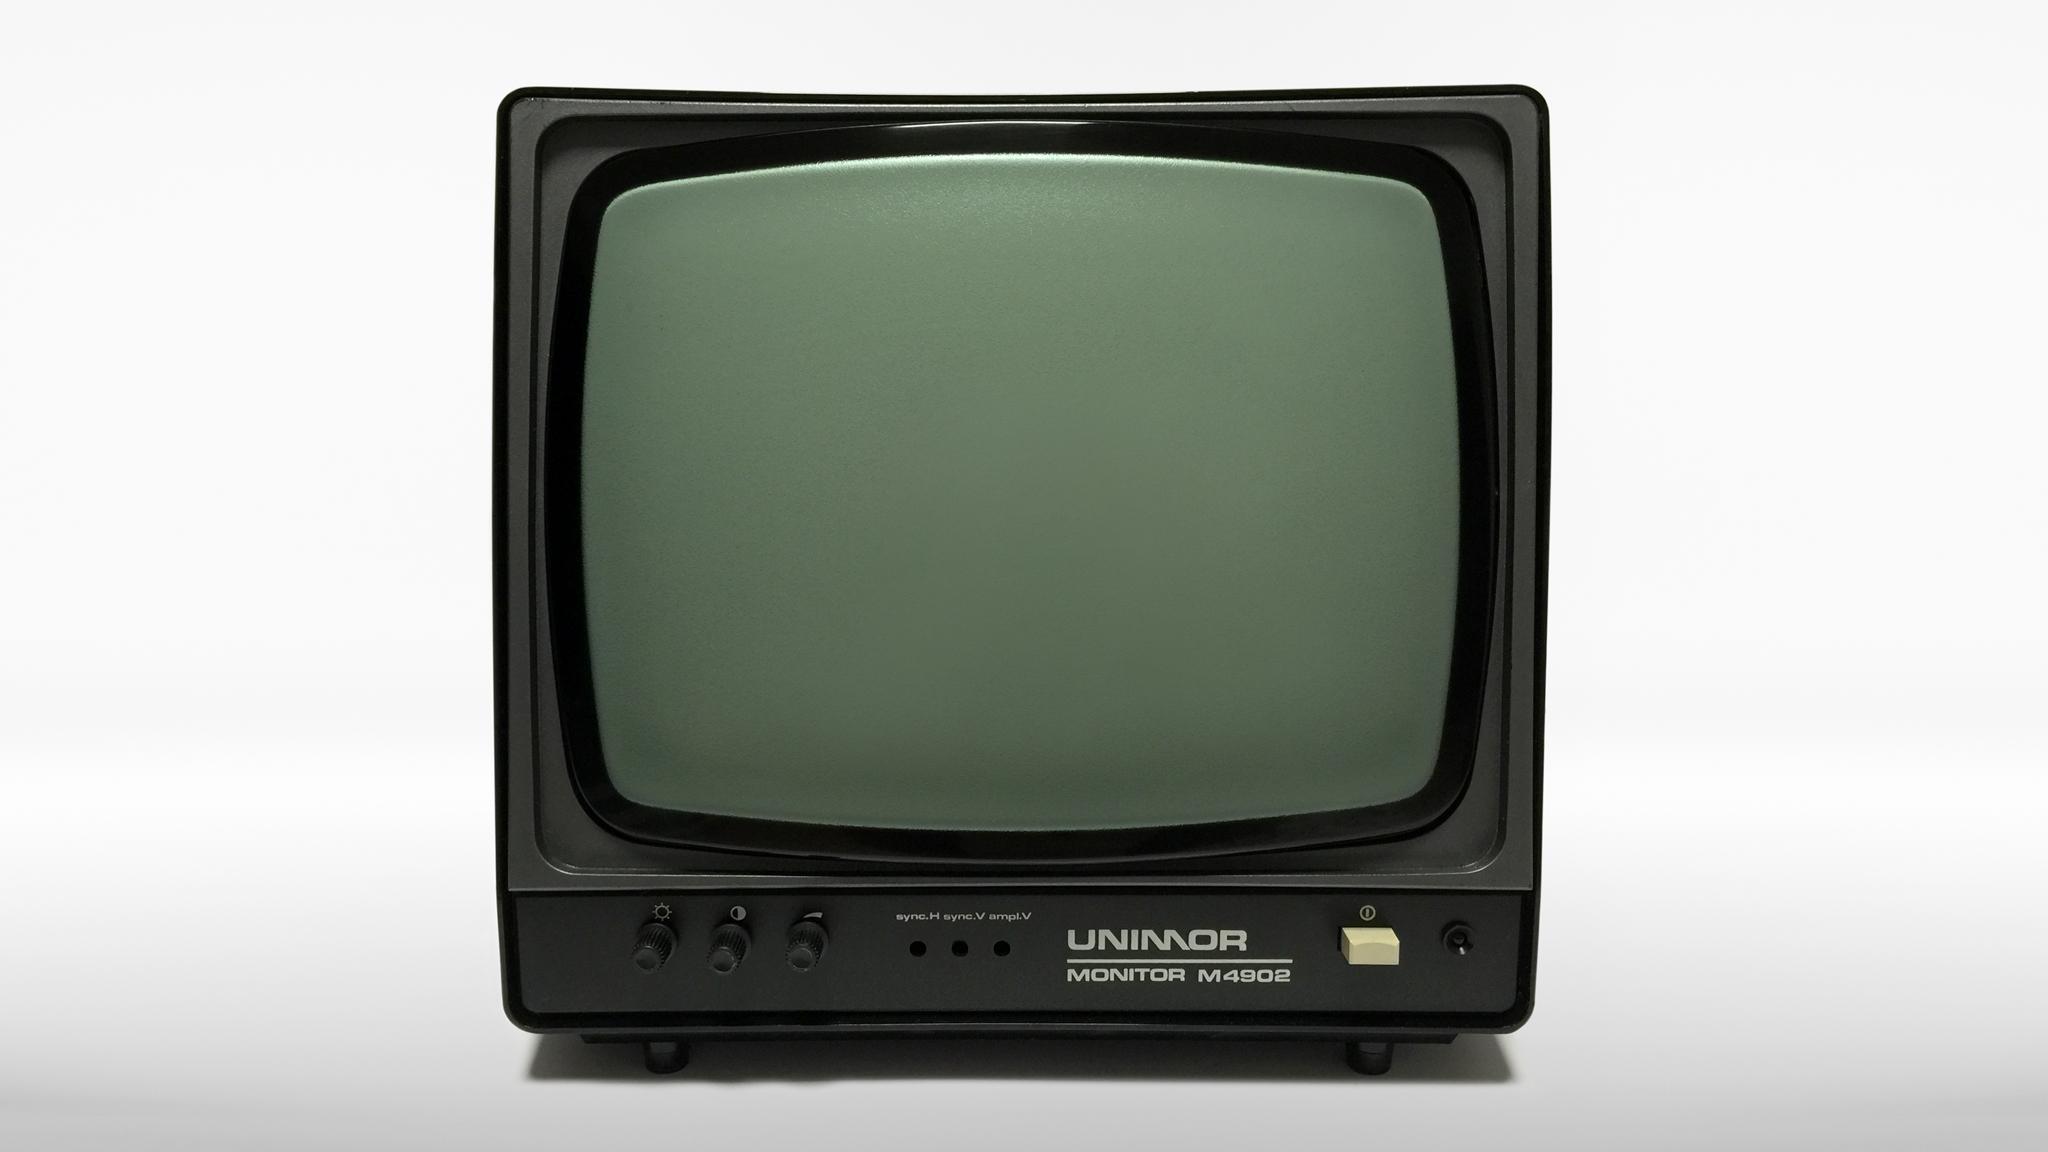 UNIMOR Monitor M4902 #0295275